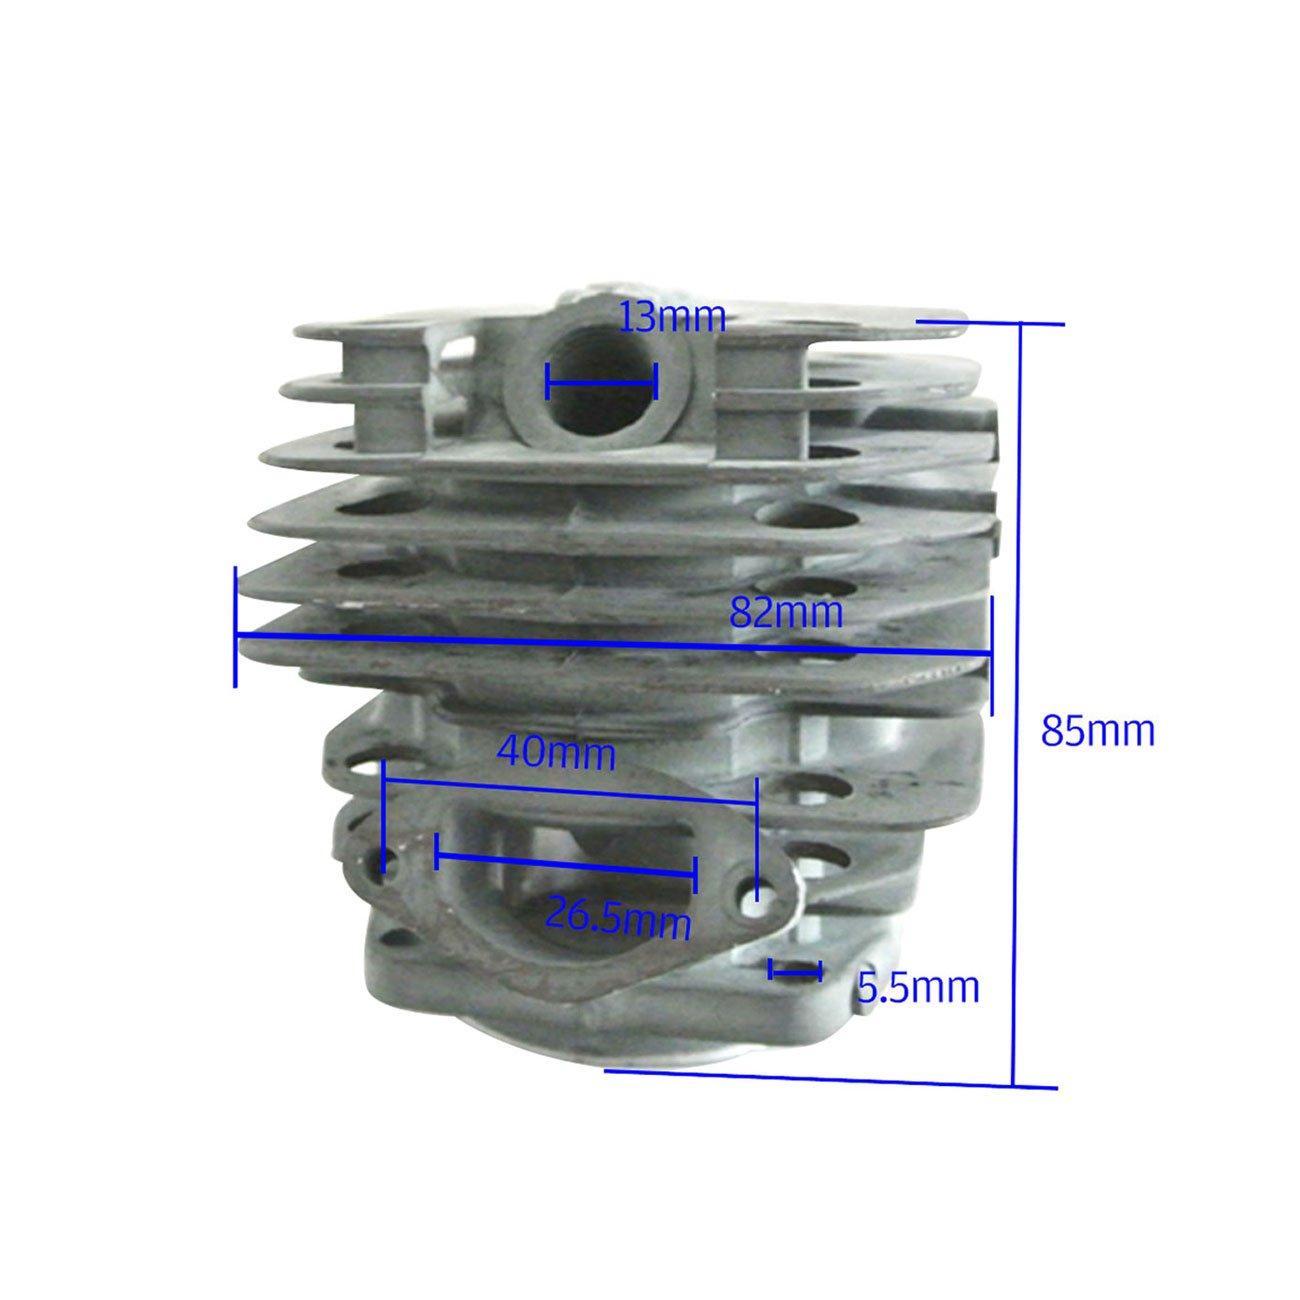 JRL Kit de Pist/ón cil/índrico para Motores DE 45 mm para Chino 5200 52 CC Motosierra Kiam Silverline